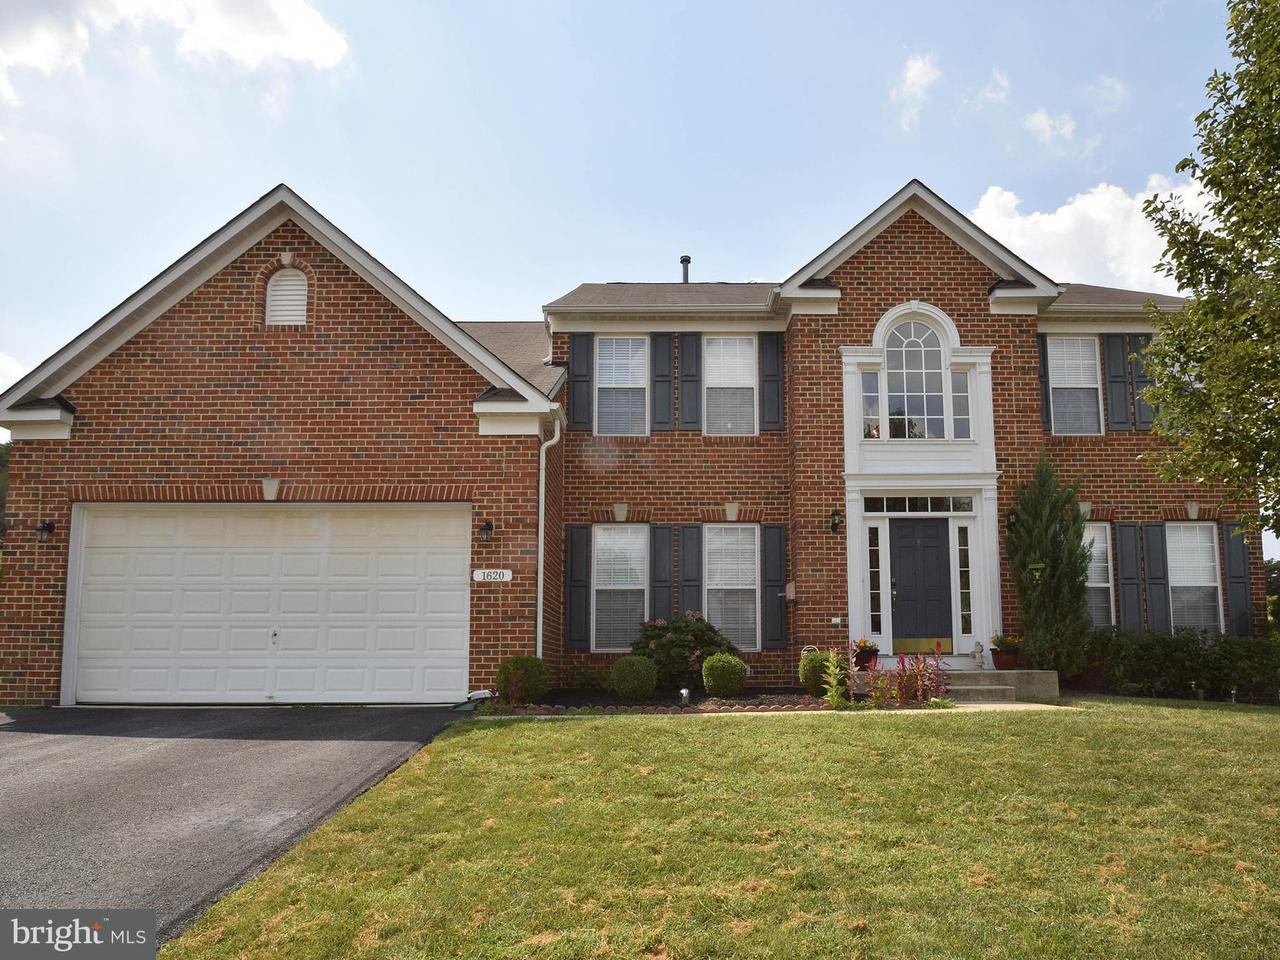 Single Family Home for Sale at 1620 BEAR PAW Lane 1620 BEAR PAW Lane Hanover, Maryland 21076 United States